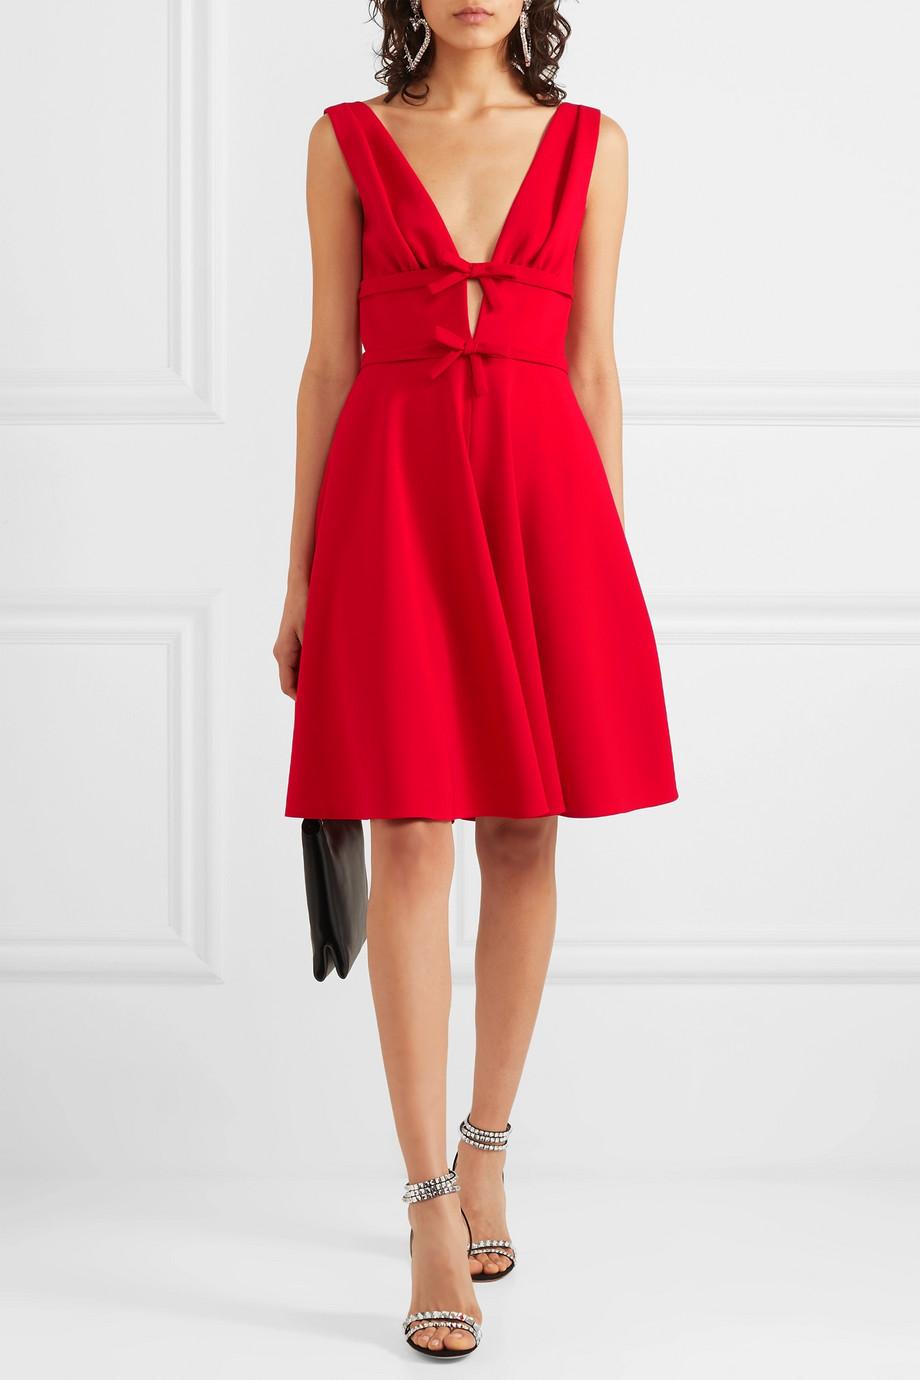 Miu Miu Bow-embellished cady dress